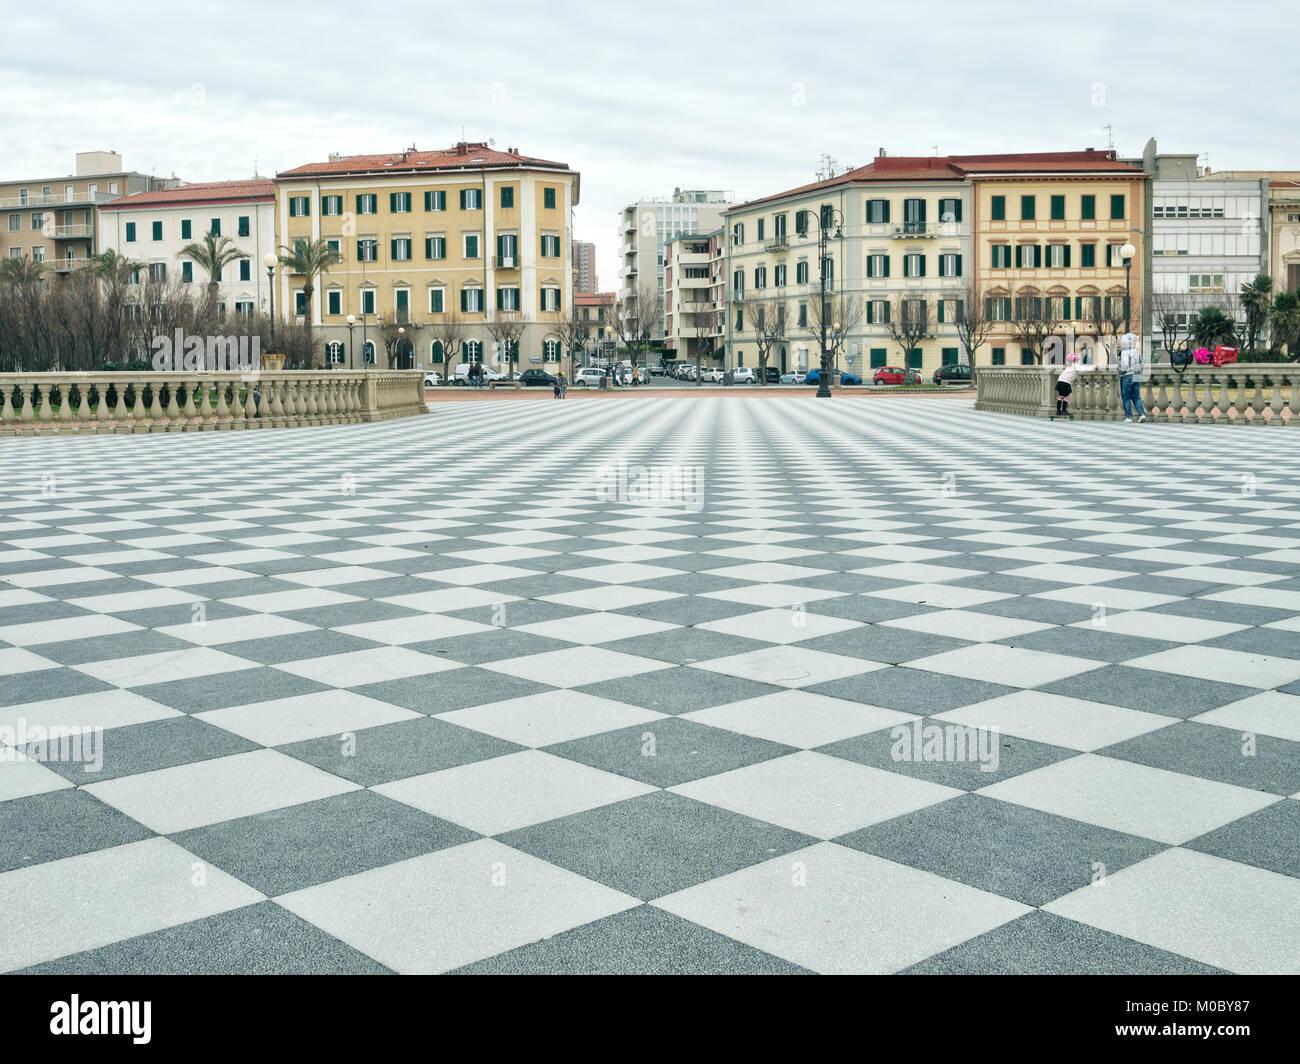 Terrazza Mascagni Stockfotos & Terrazza Mascagni Bilder - Alamy